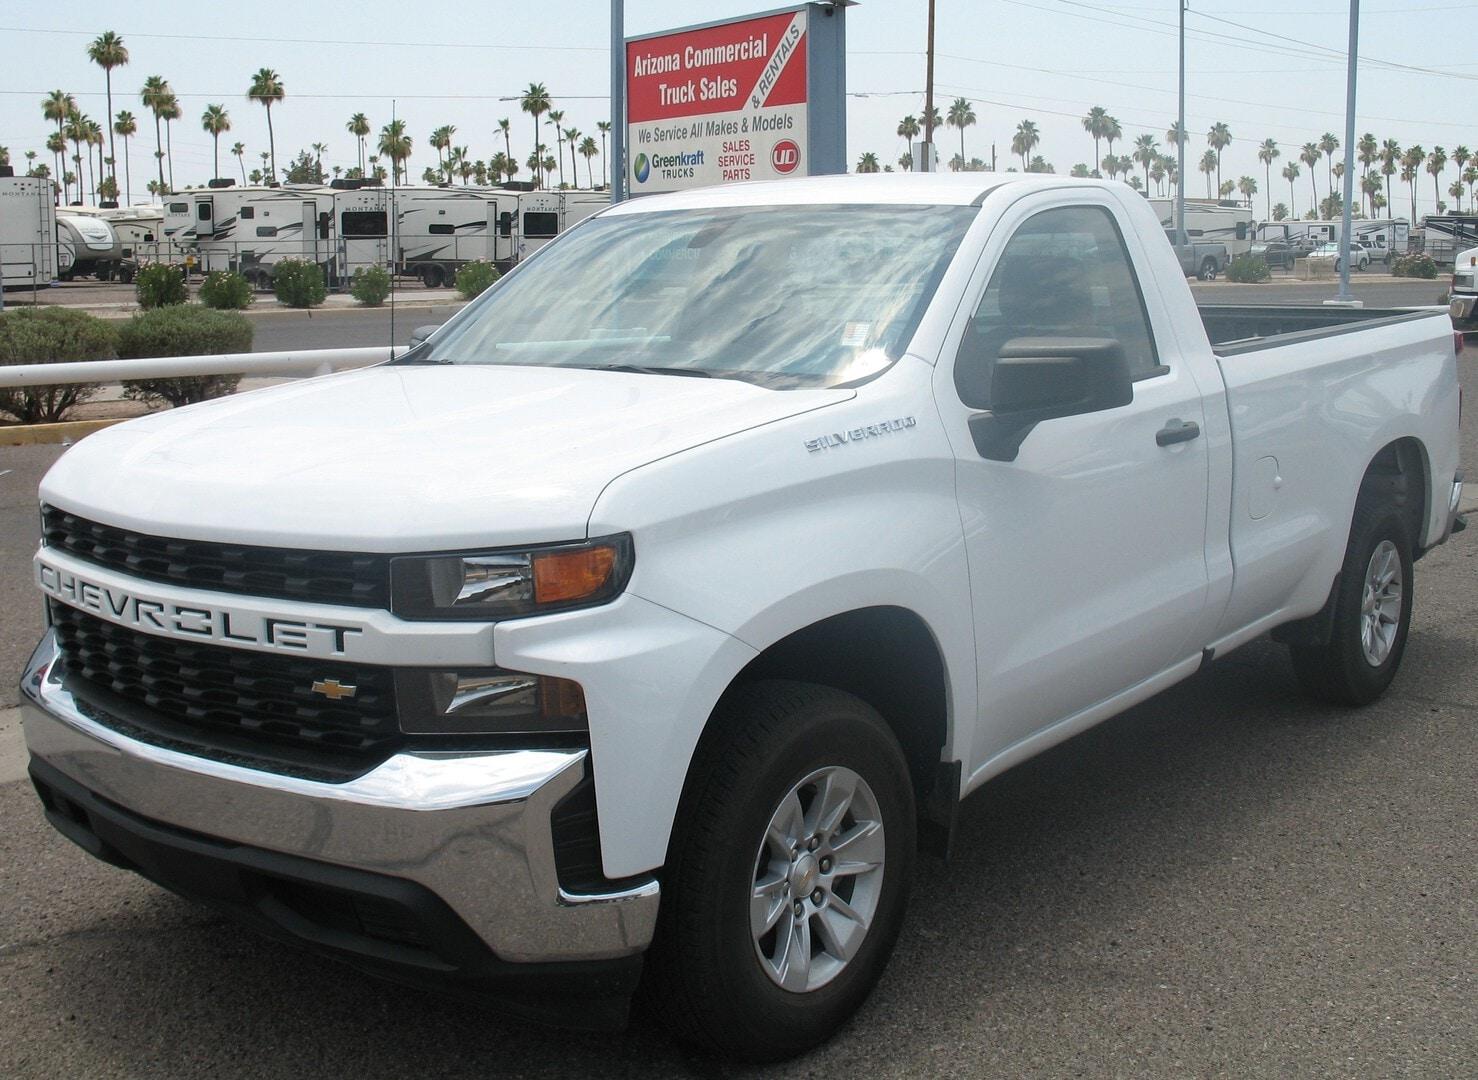 Used, 2020, Chevrolet, Silverado 1500, Pickup Trucks